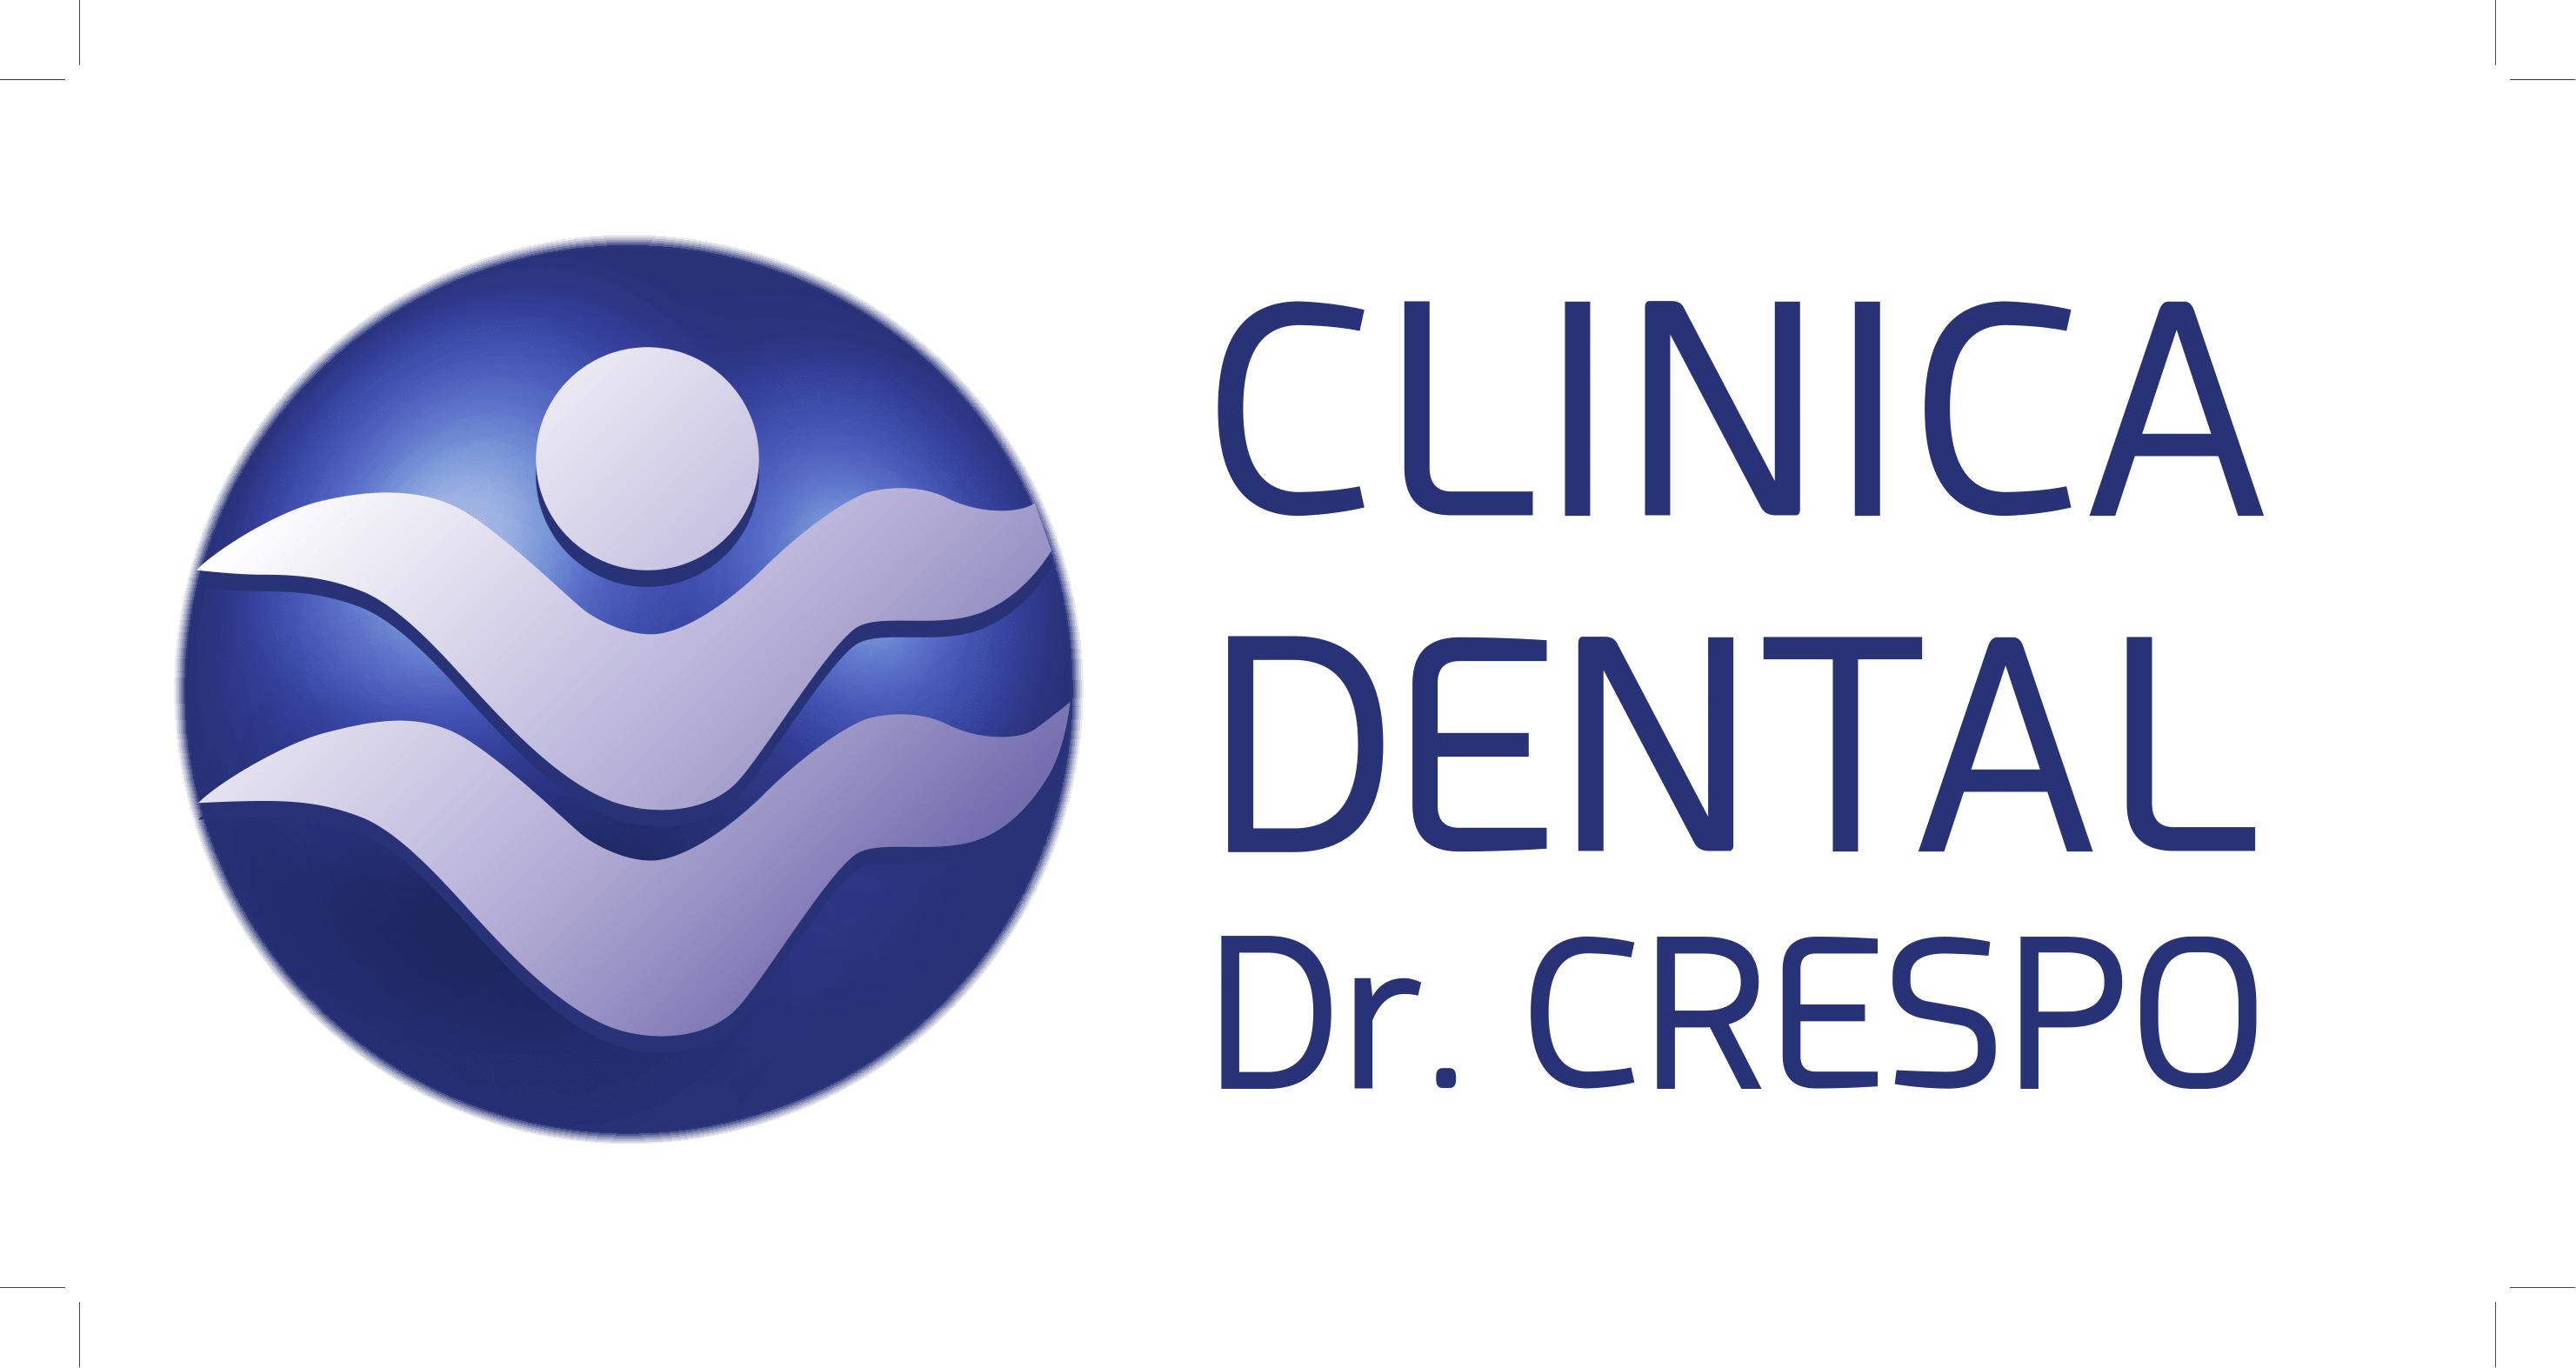 Clínica Dental Las Rozas Dr. Crespo